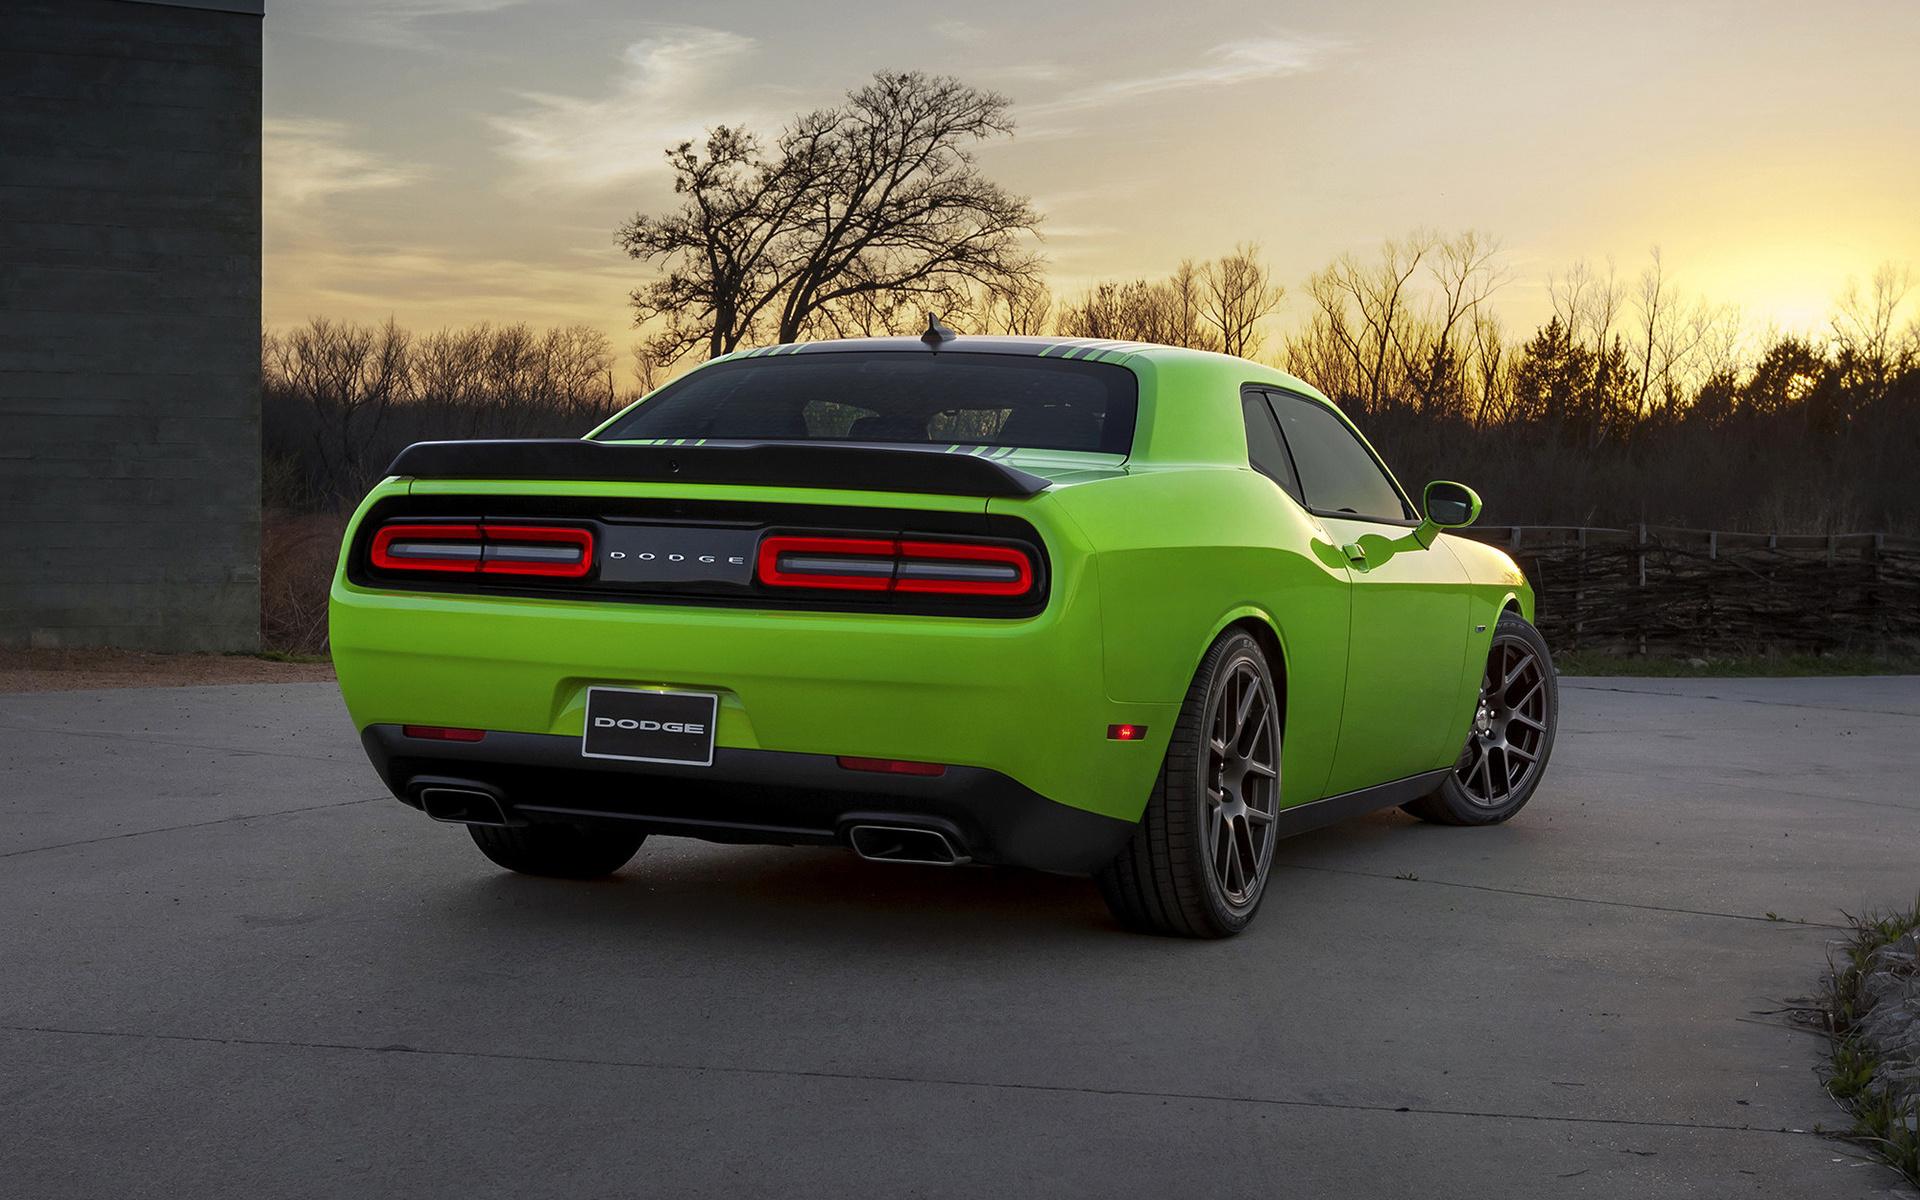 2015 Dodge Challenger Sxt Plus >> 2015 Dodge Challenger R/T Shaker - Wallpapers and HD ...